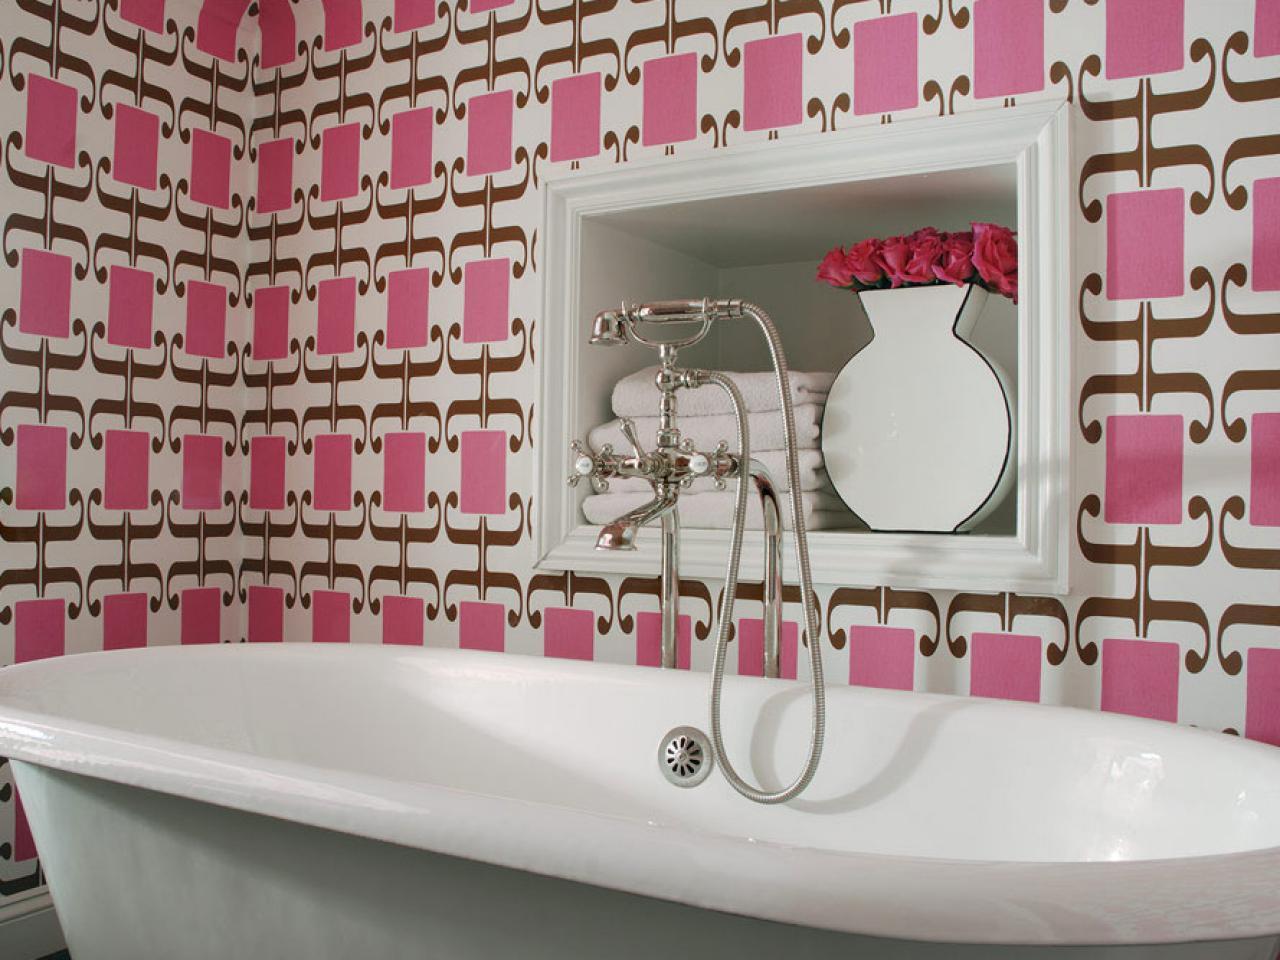 Original_Colorful-Bathrooms-Caldwell-Flake-Interior-Design-Pink-Wallpaper_s4x3.jpg.rend.hgtvcom.1280.960